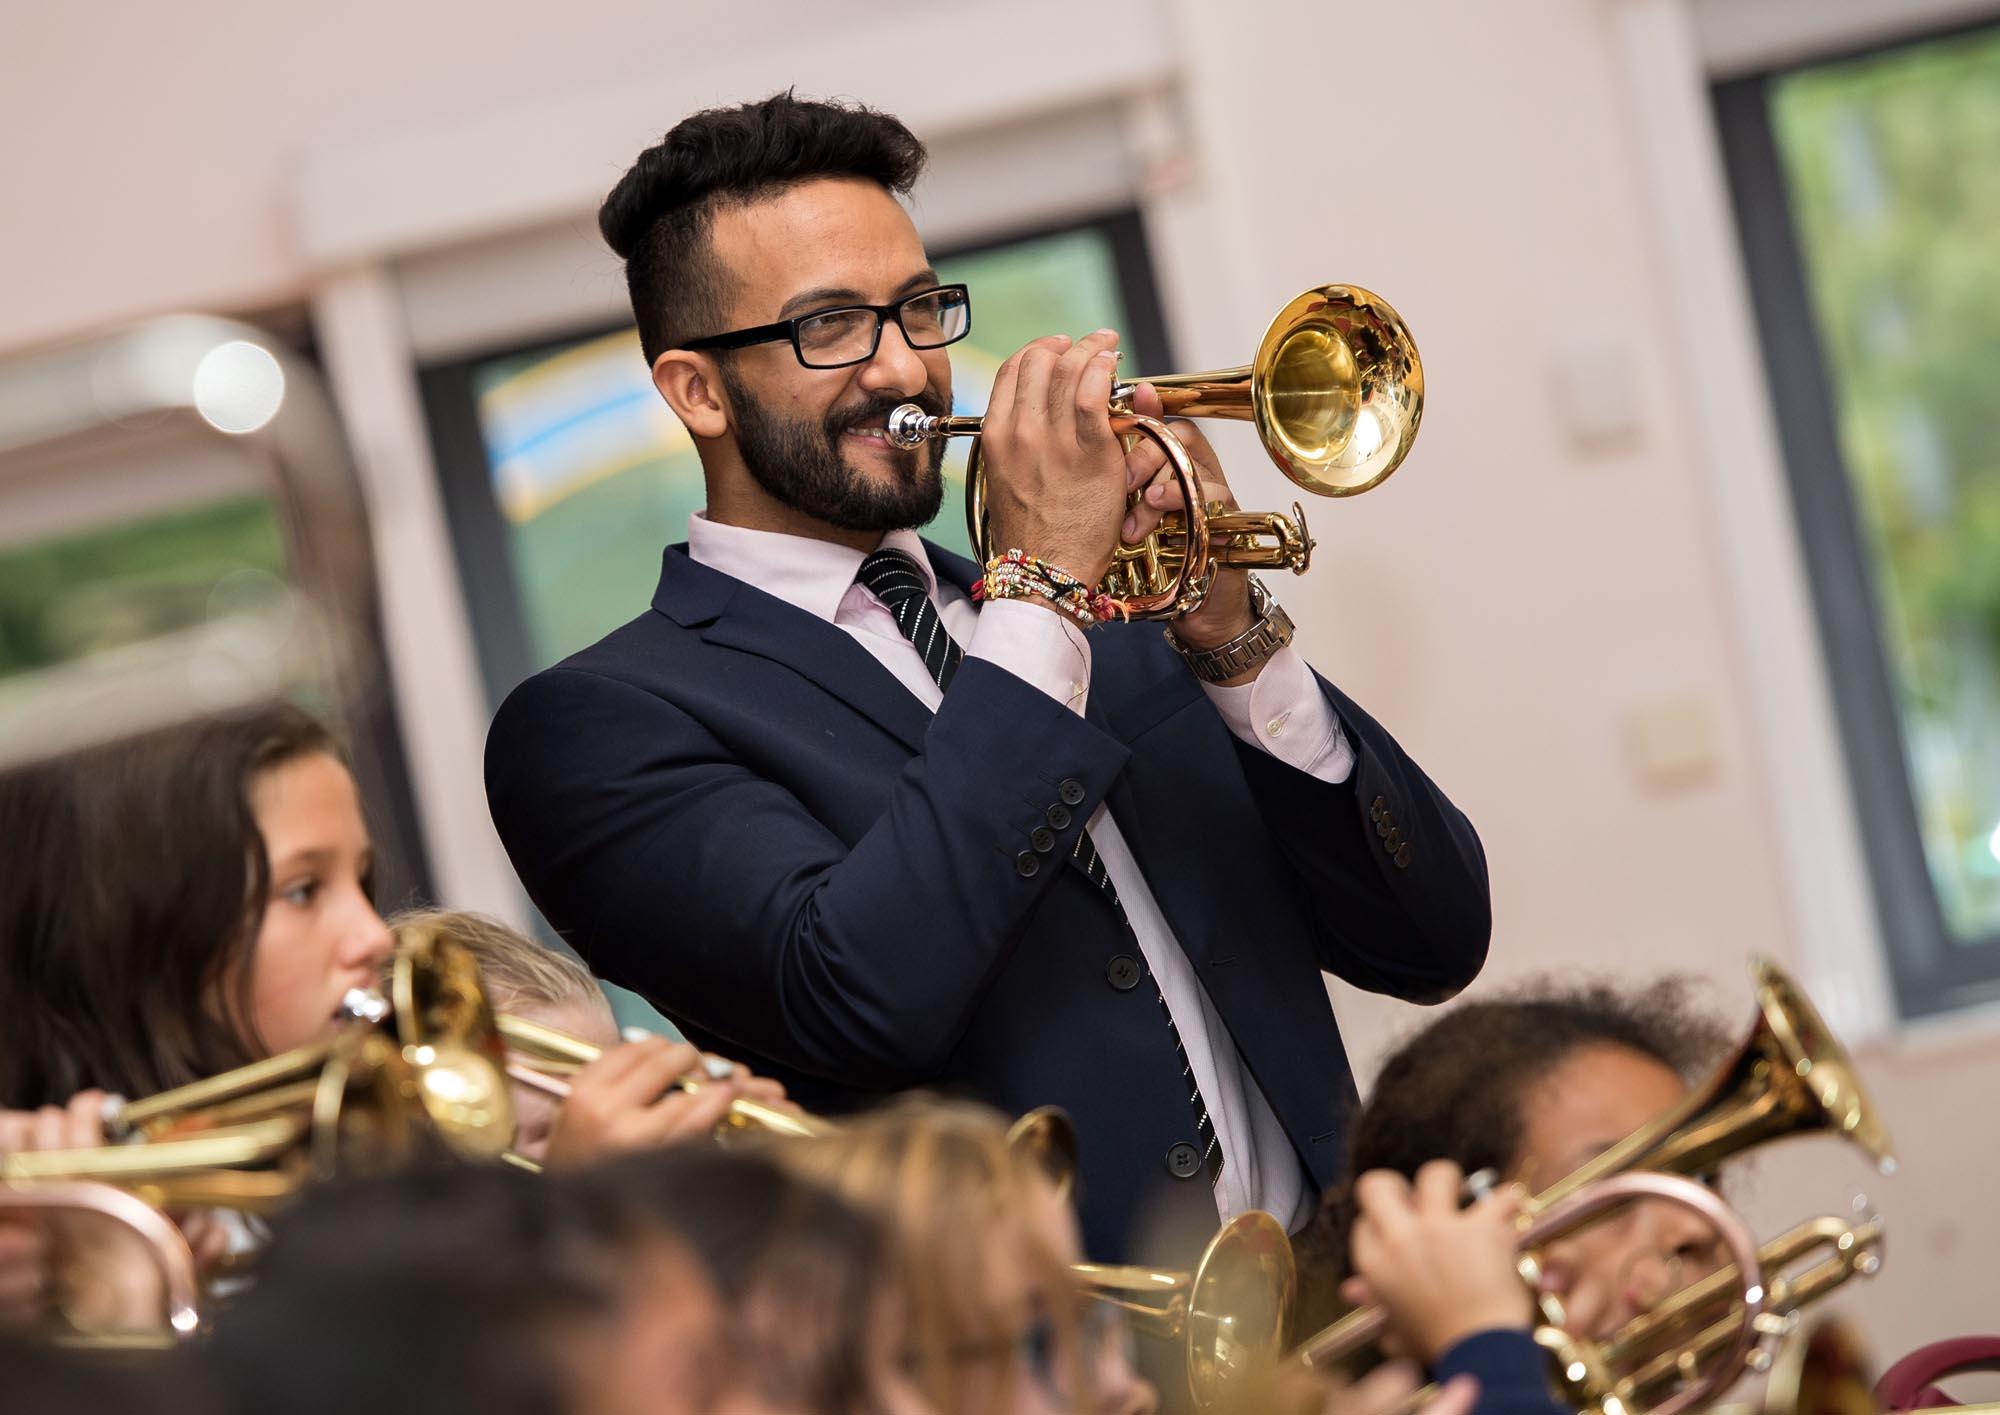 Mr Bali playing the cornet